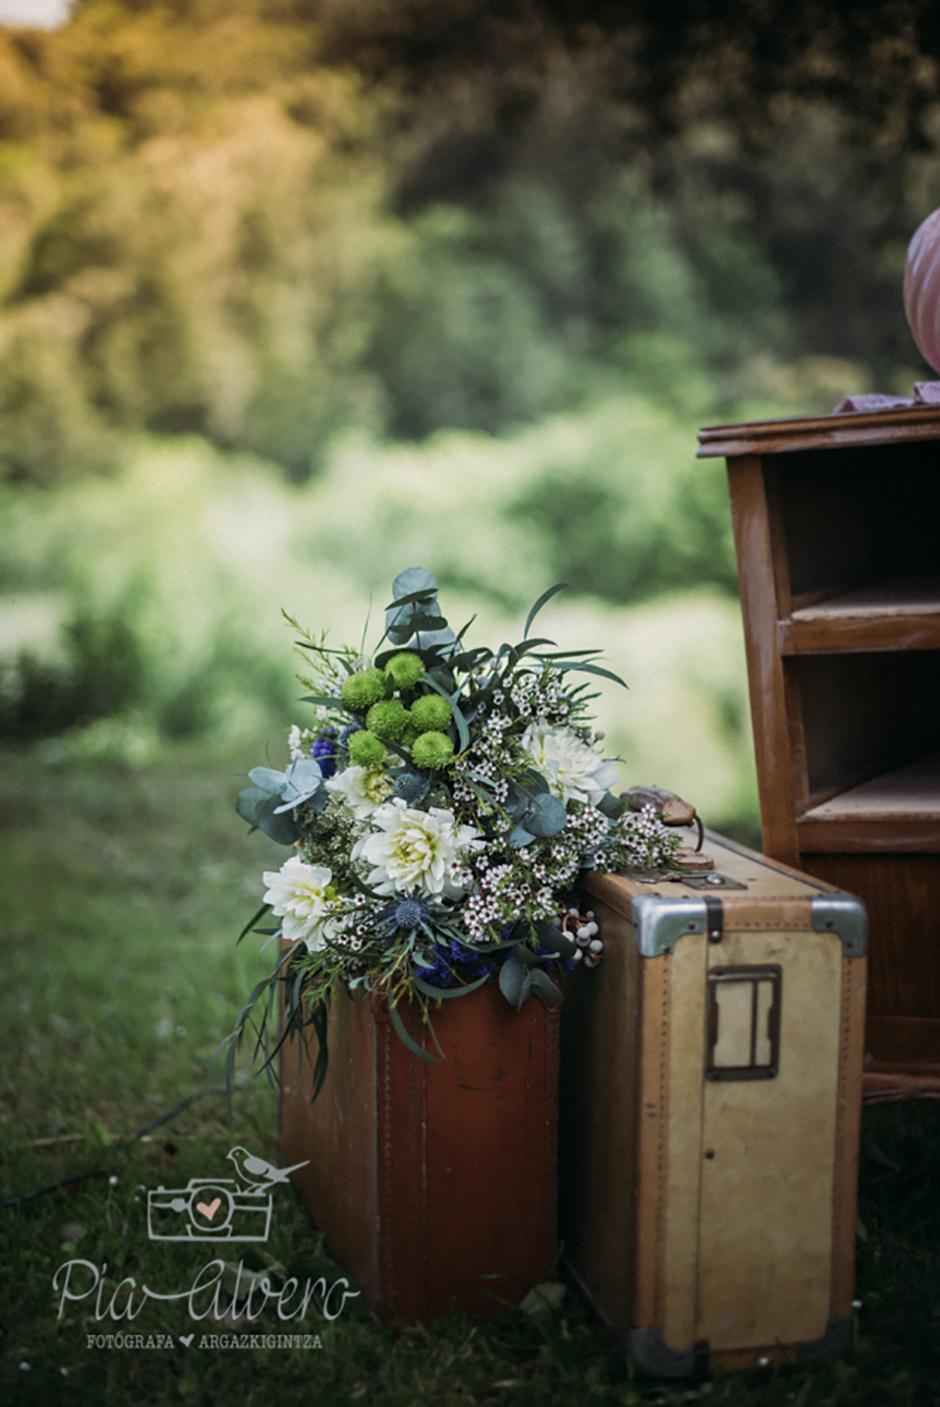 Pia Alvero fotografia editorial inspiracion de boda-108